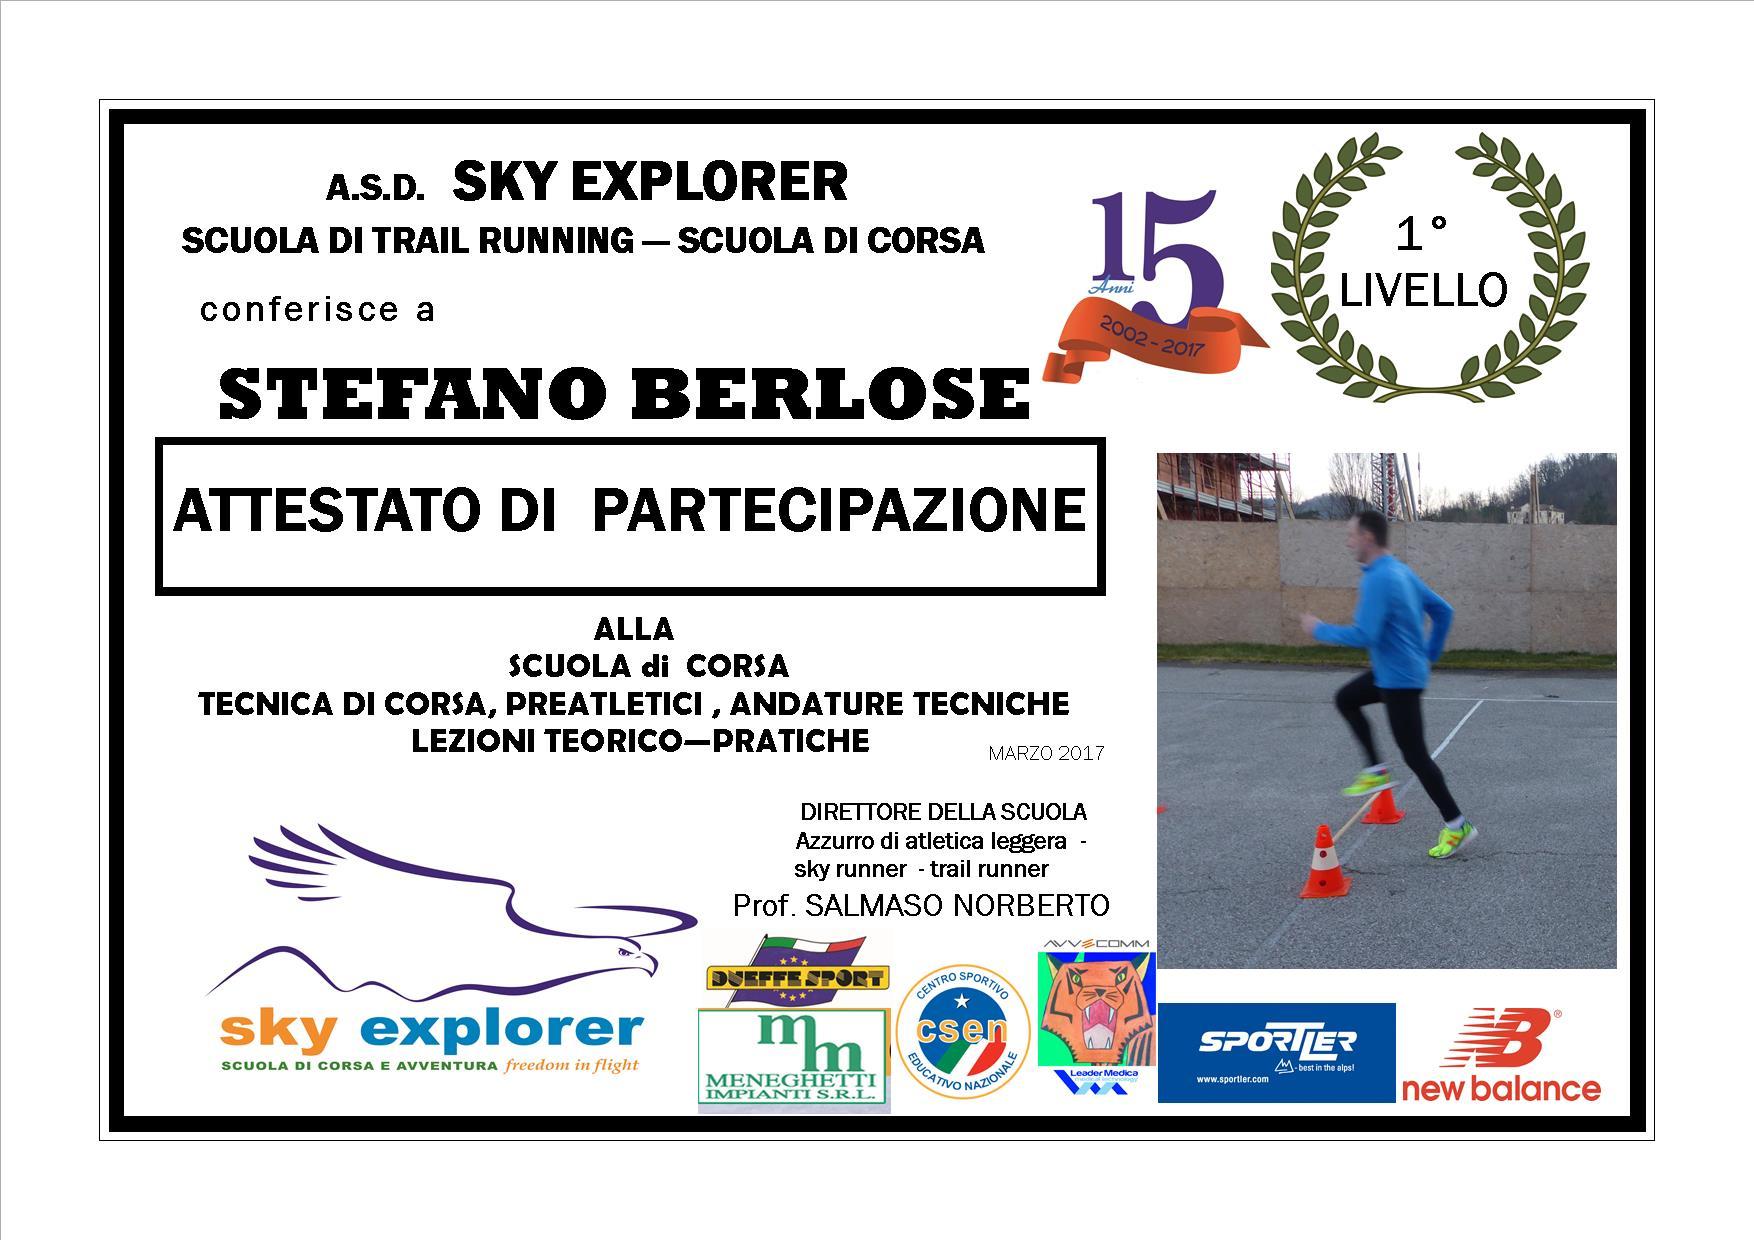 2017 STEFANO BERLOSE ATTESTATO 1 LIVELLO SKYRUNNER